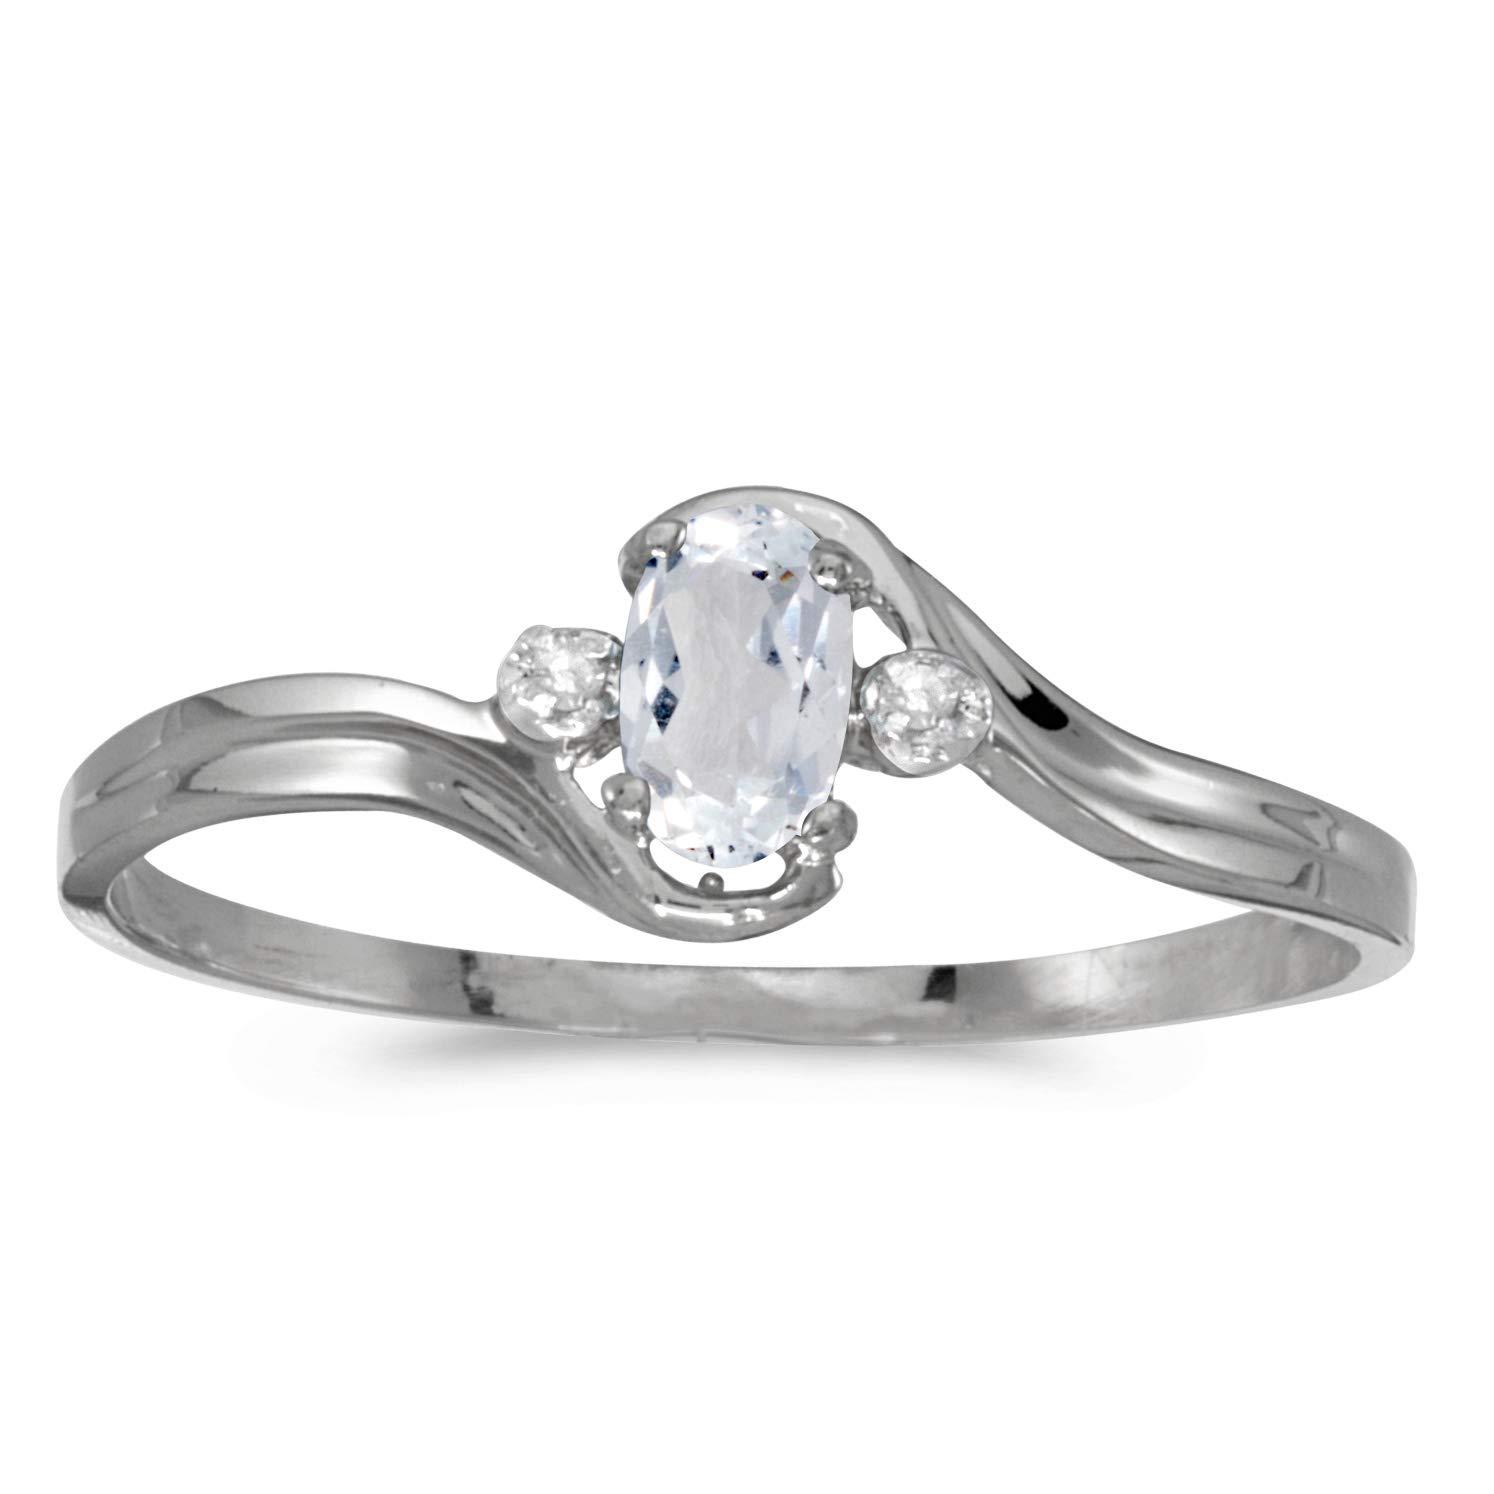 FB Jewels 14k White Gold Genuine Birthstone Solitaire Oval Gemstone And Diamond Wedding Engagement Statement Ring